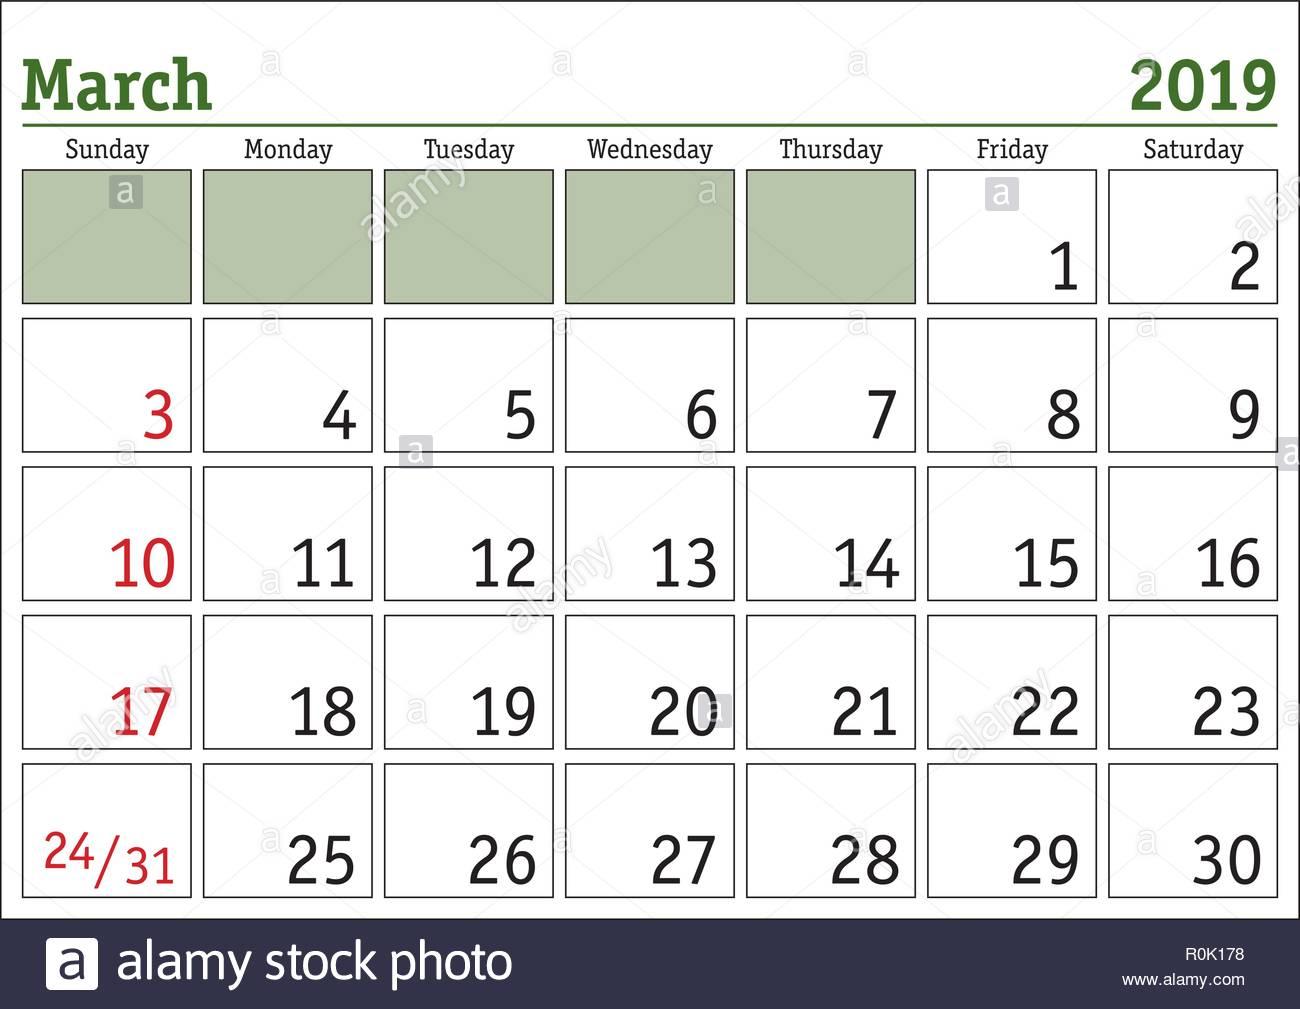 simple digital calendar for march 2019 vector printable calendar monthly scheduler week starts on sunday english calendar